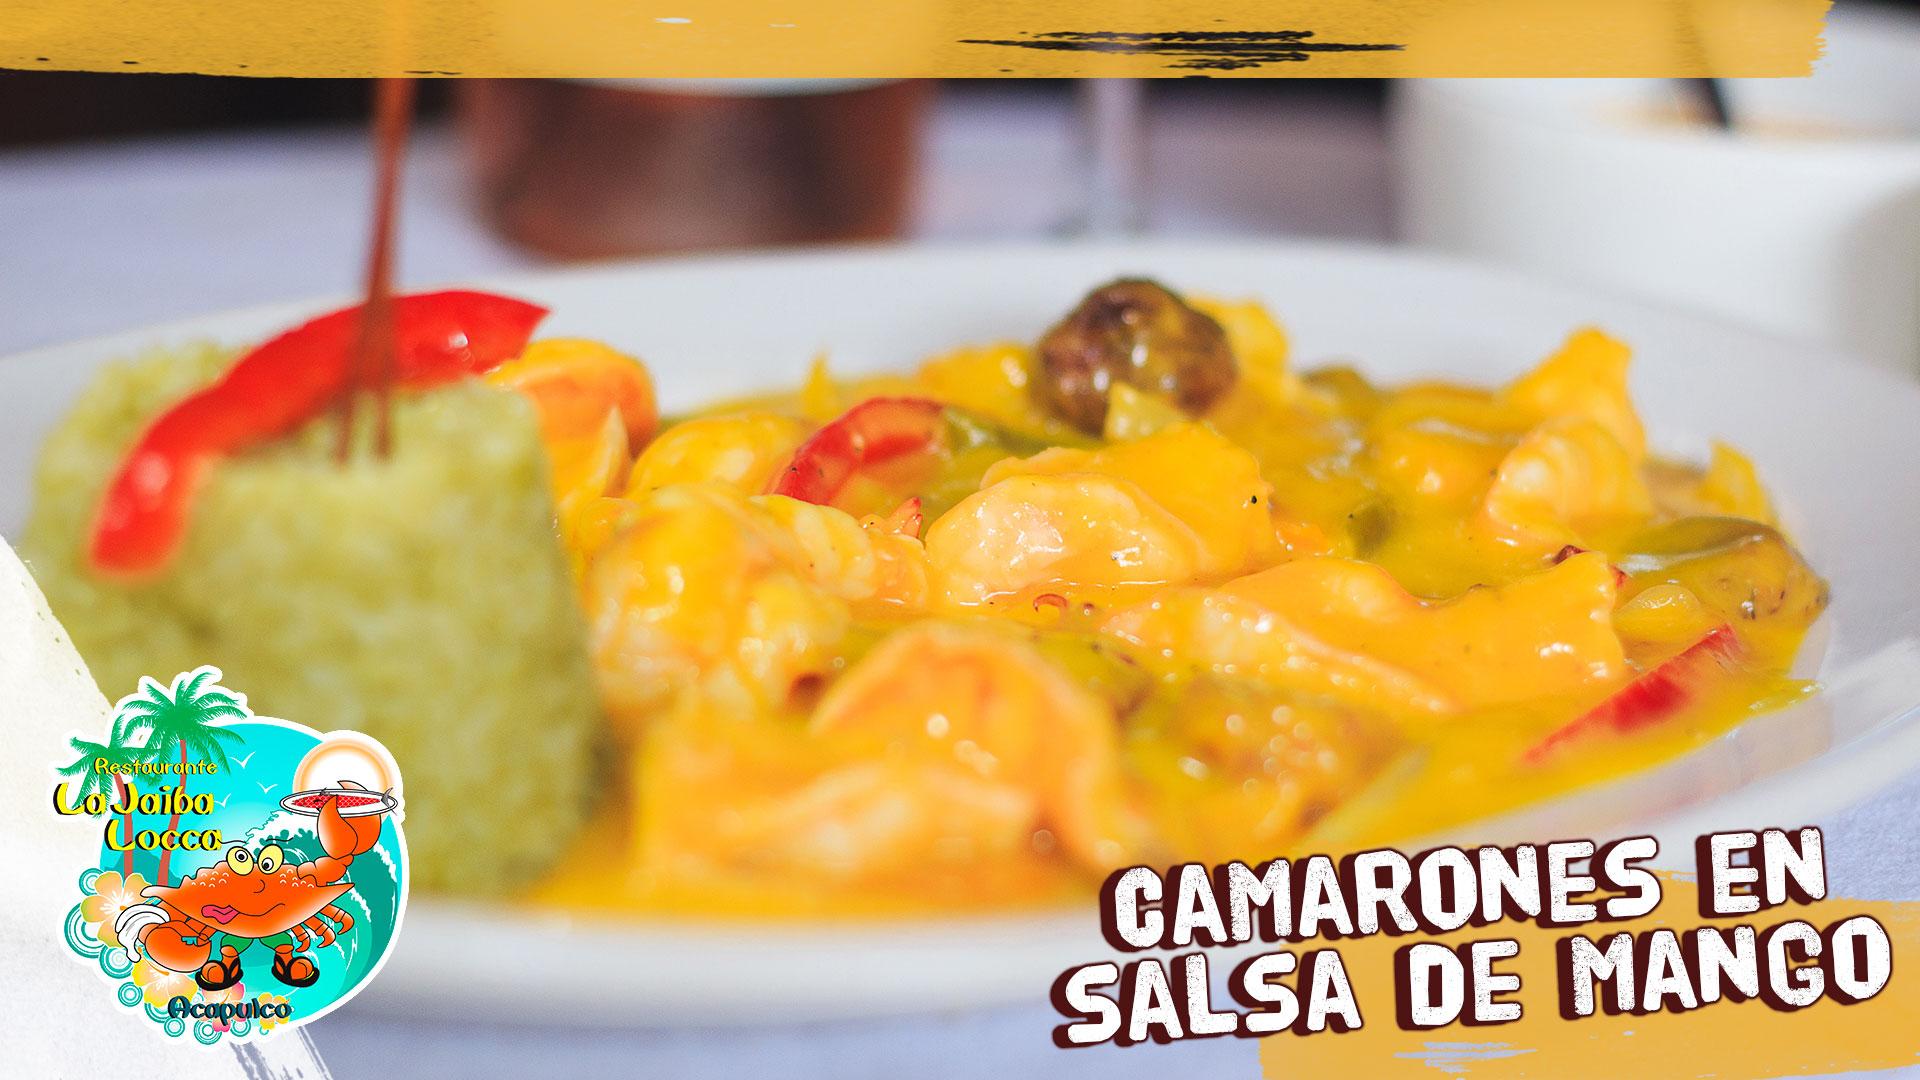 https://0201.nccdn.net/1_2/000/000/131/dfa/7--Camarones-en-Salsa-de-Mango.jpg